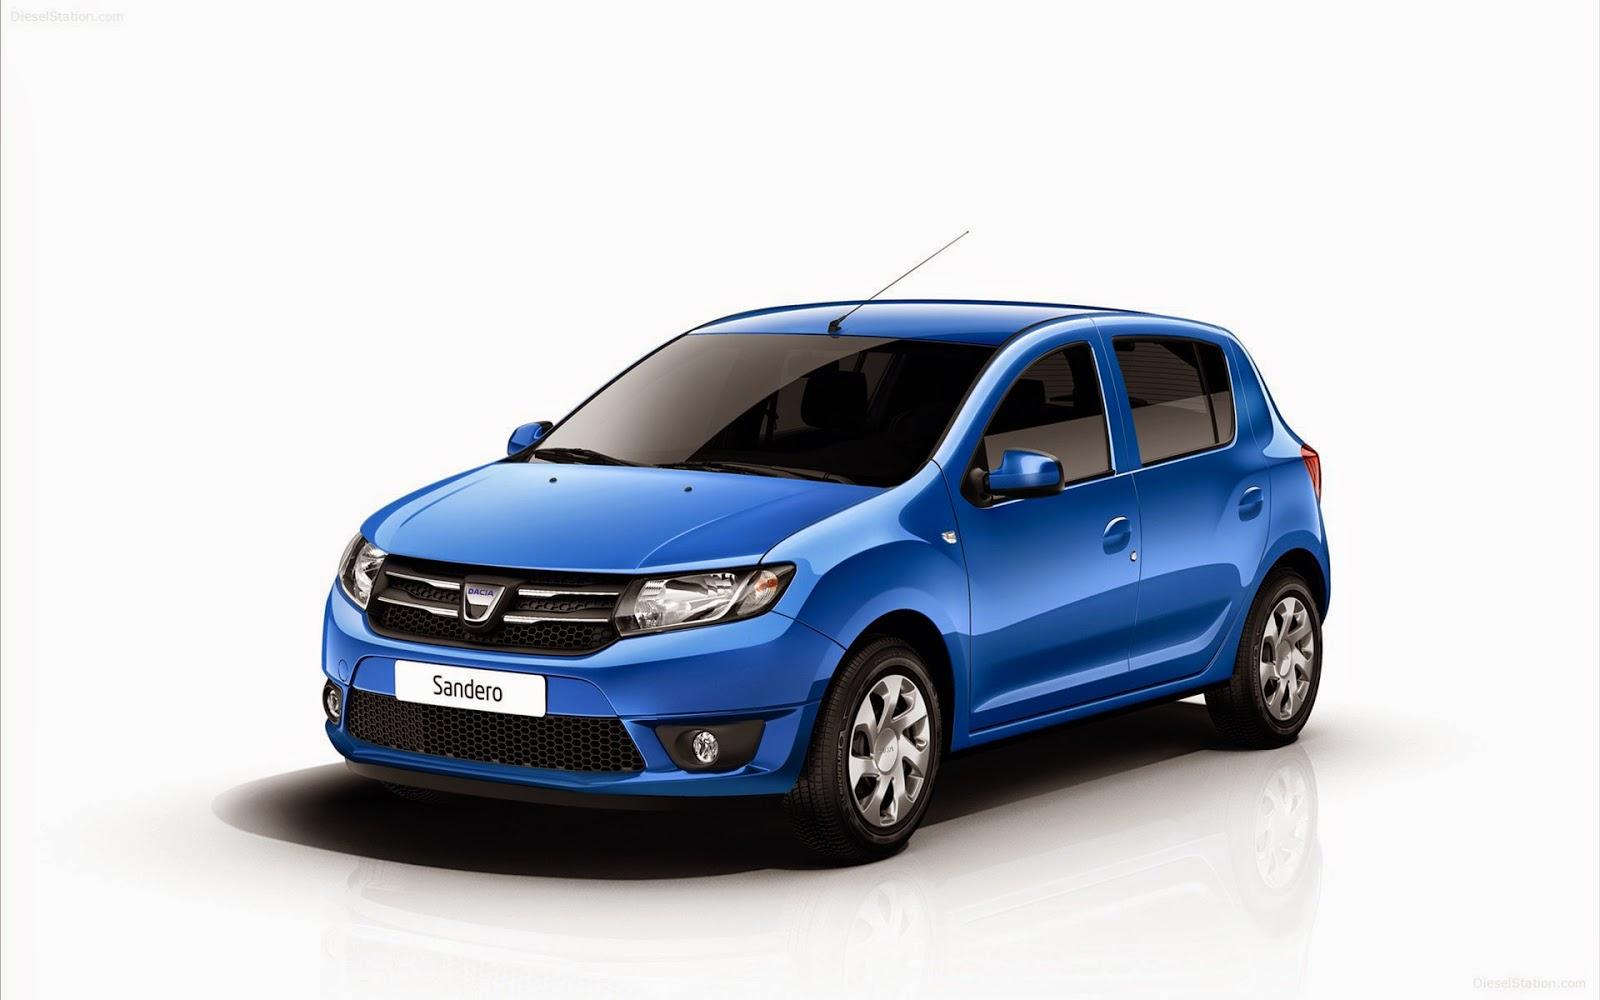 Renault Sandero 2014